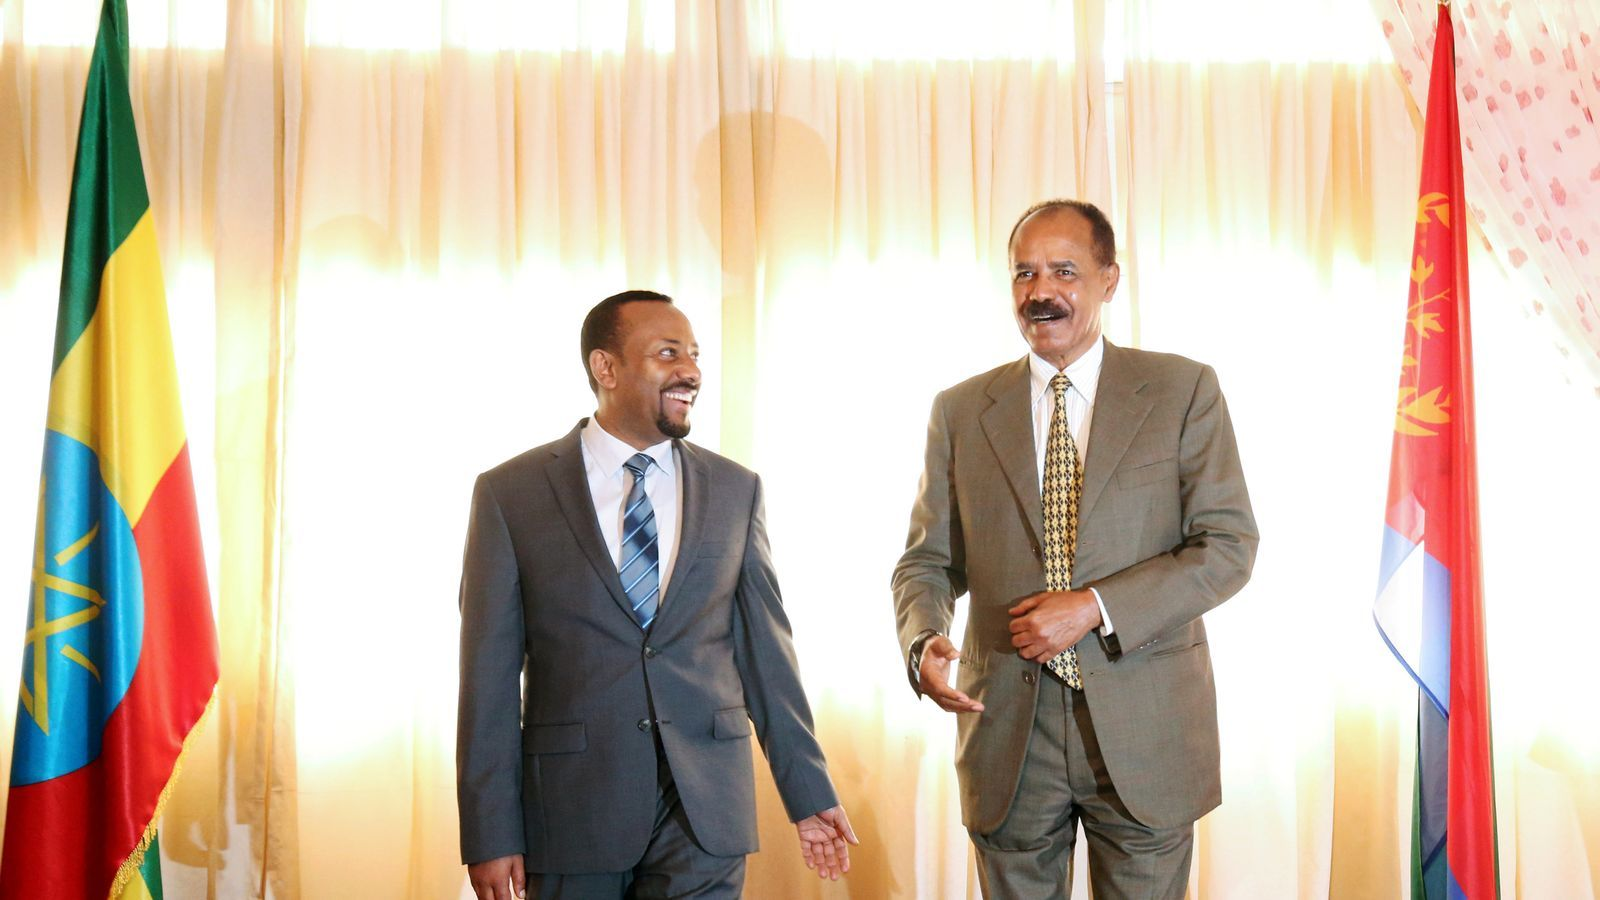 L'eritreu Isaias Afwerki mira somrient l'etíop Abiy Ahmed, a l'ambaixada eritrea d'Addis Abeba